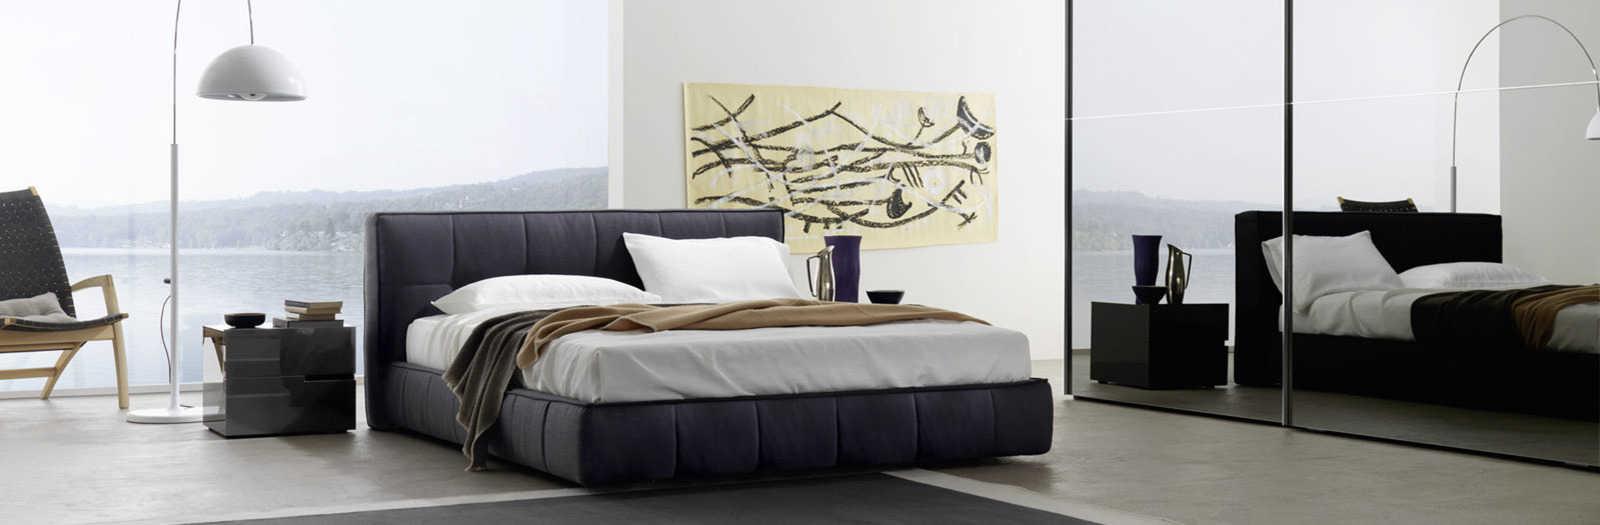 camere-stile-moderno-6